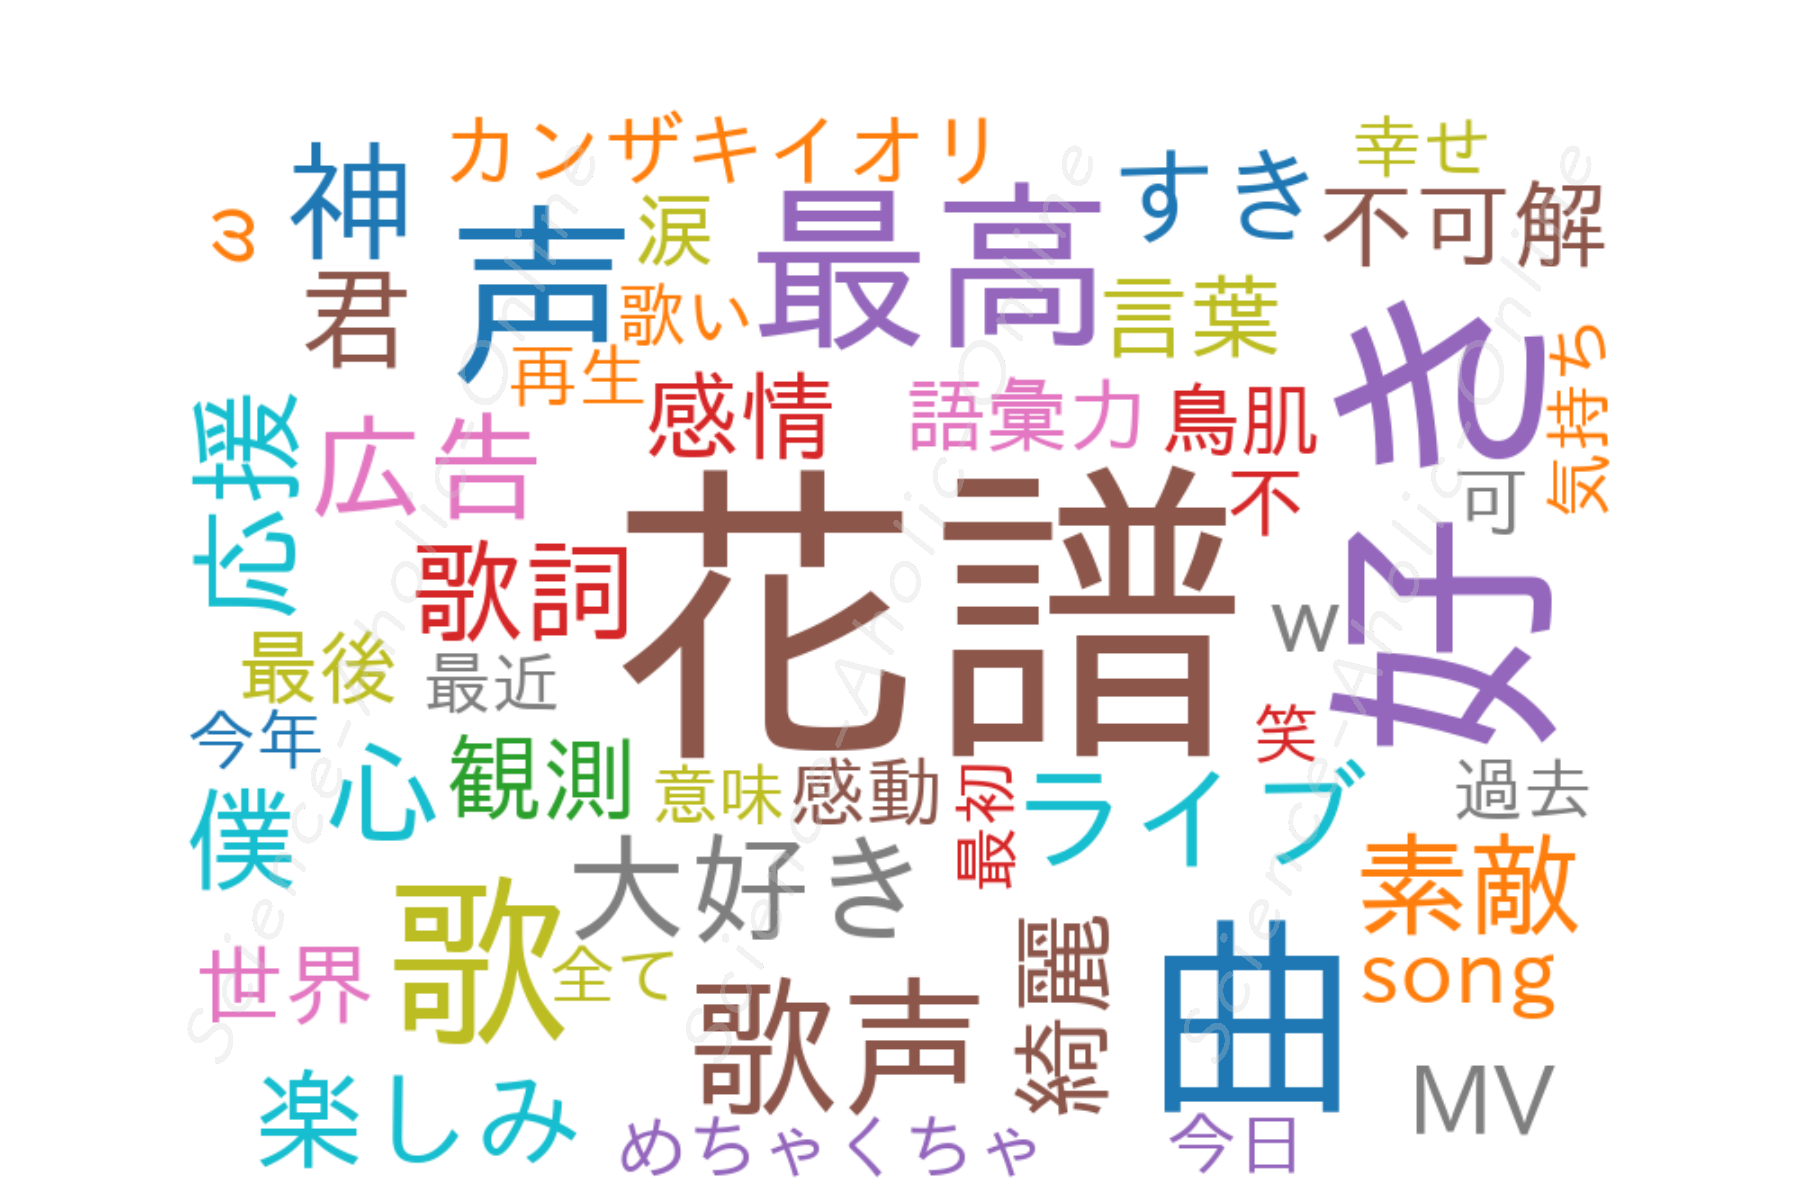 https://science-aholic-online.com/wp-content/uploads/2020/08/wordcloud_花譜.png